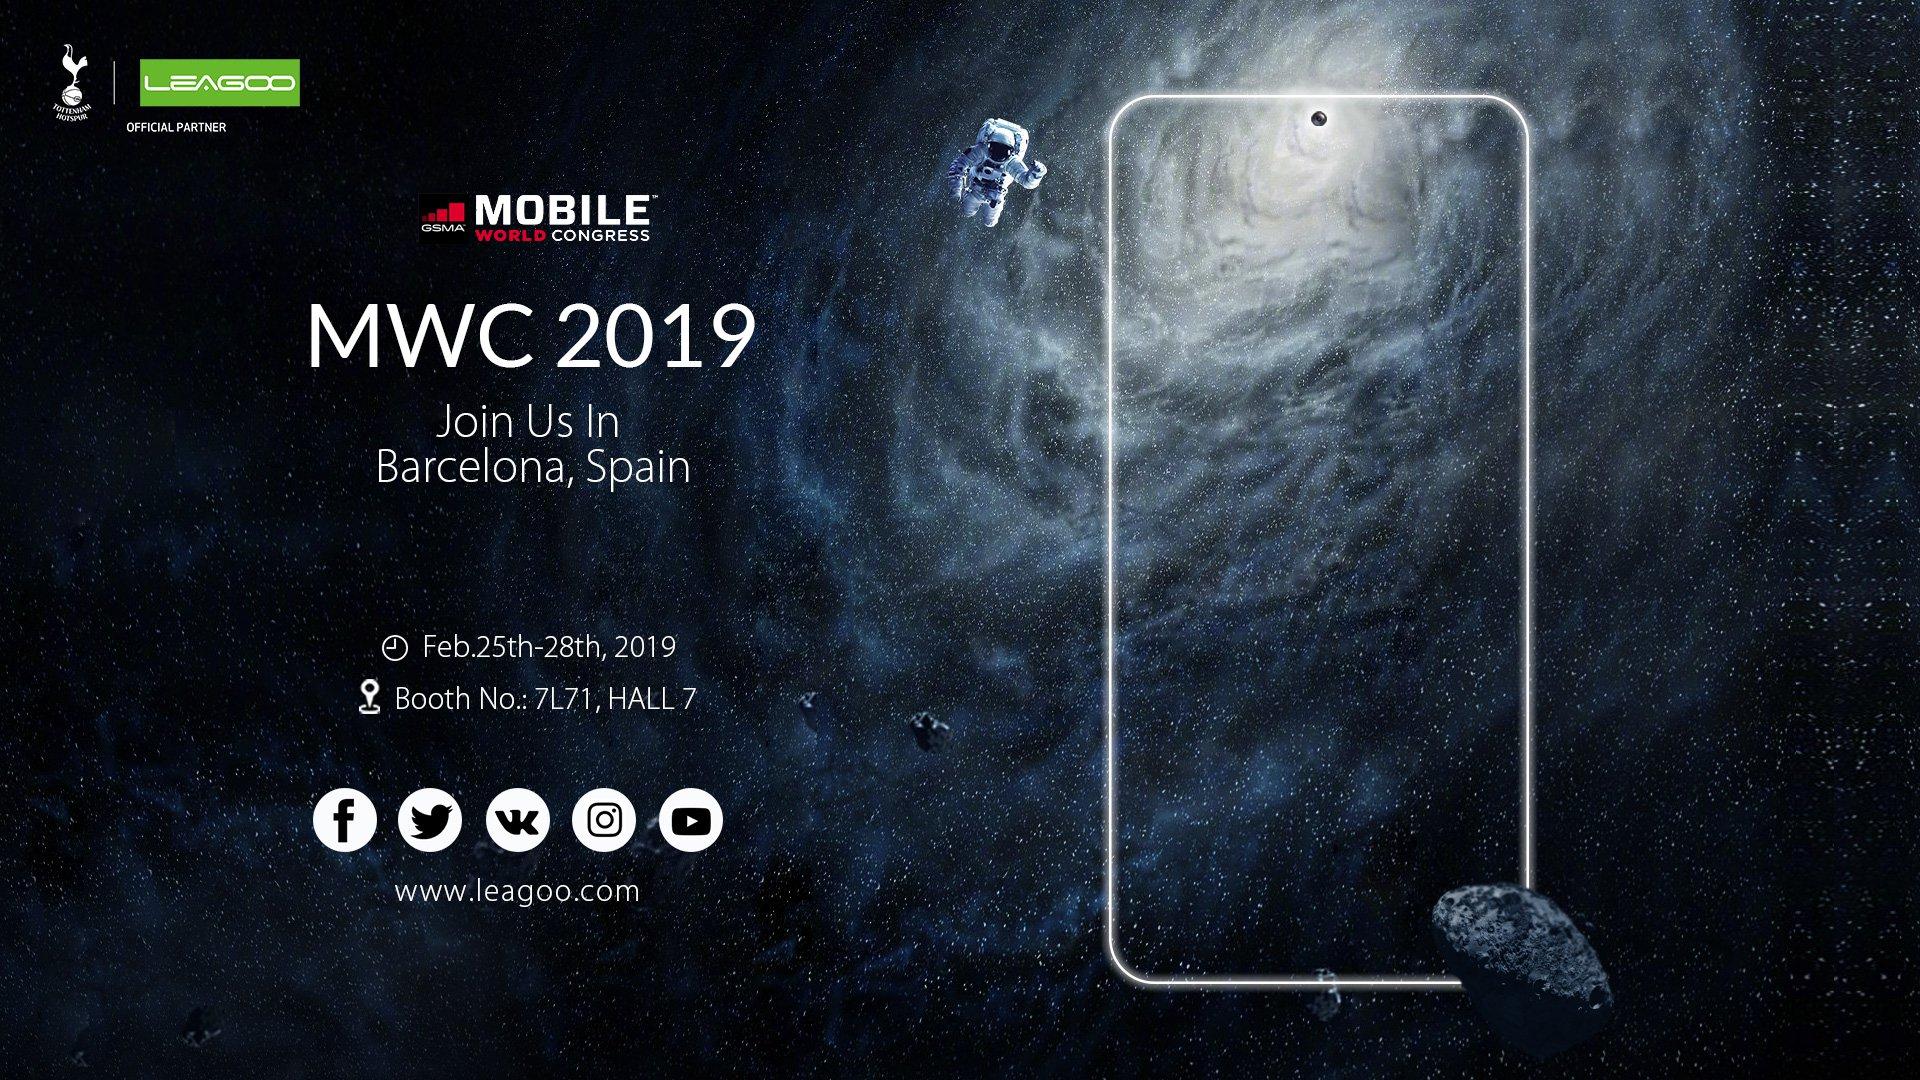 Leagoo MWC 2019